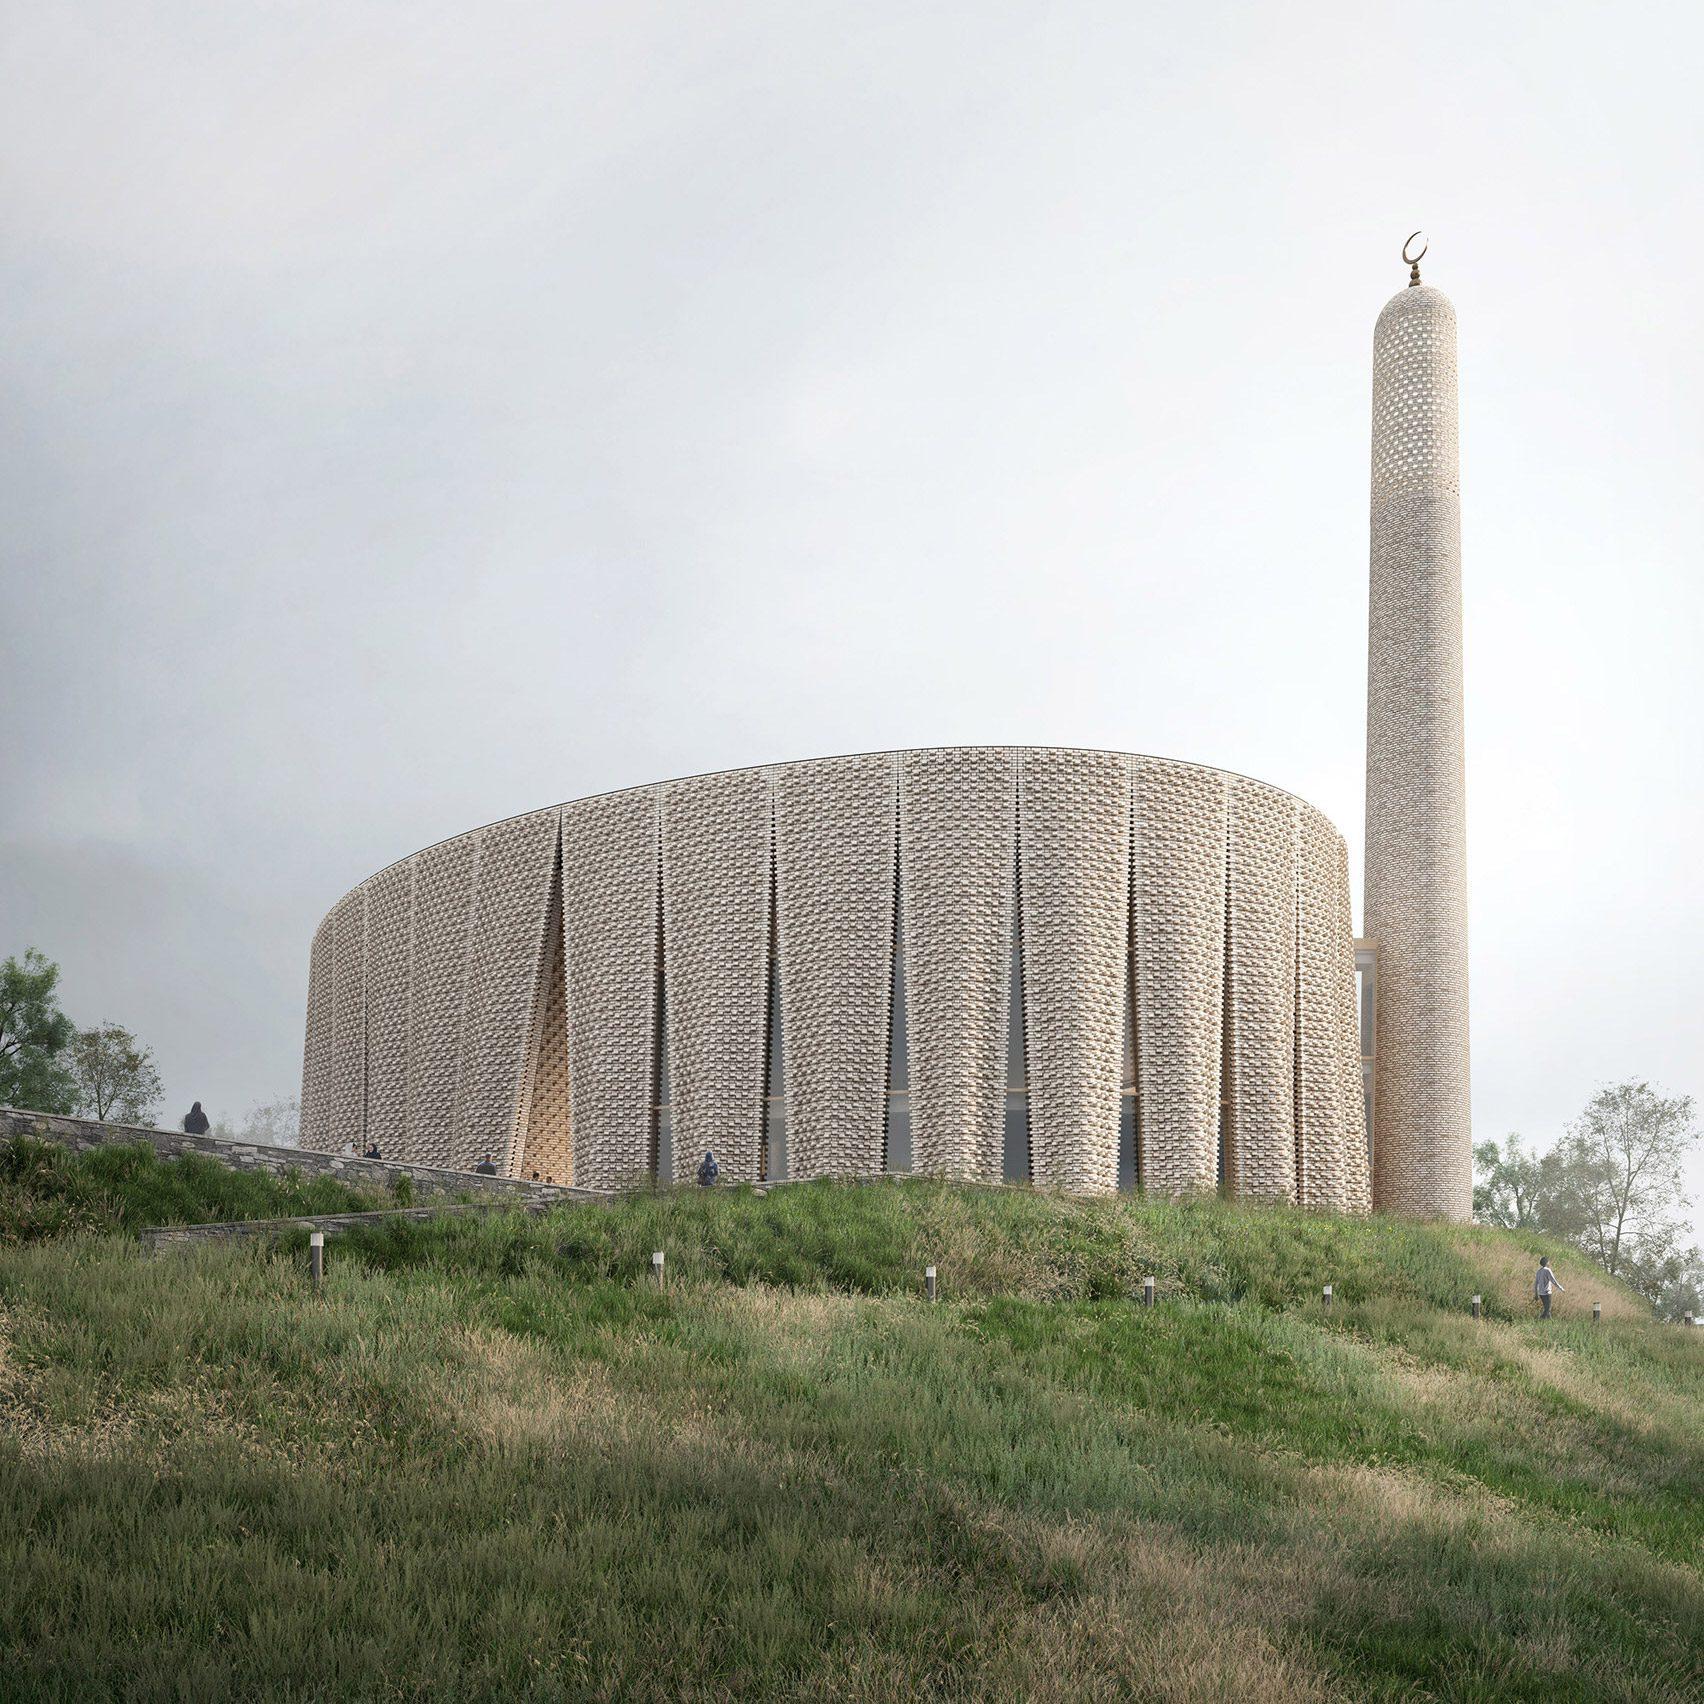 A brick mosque render